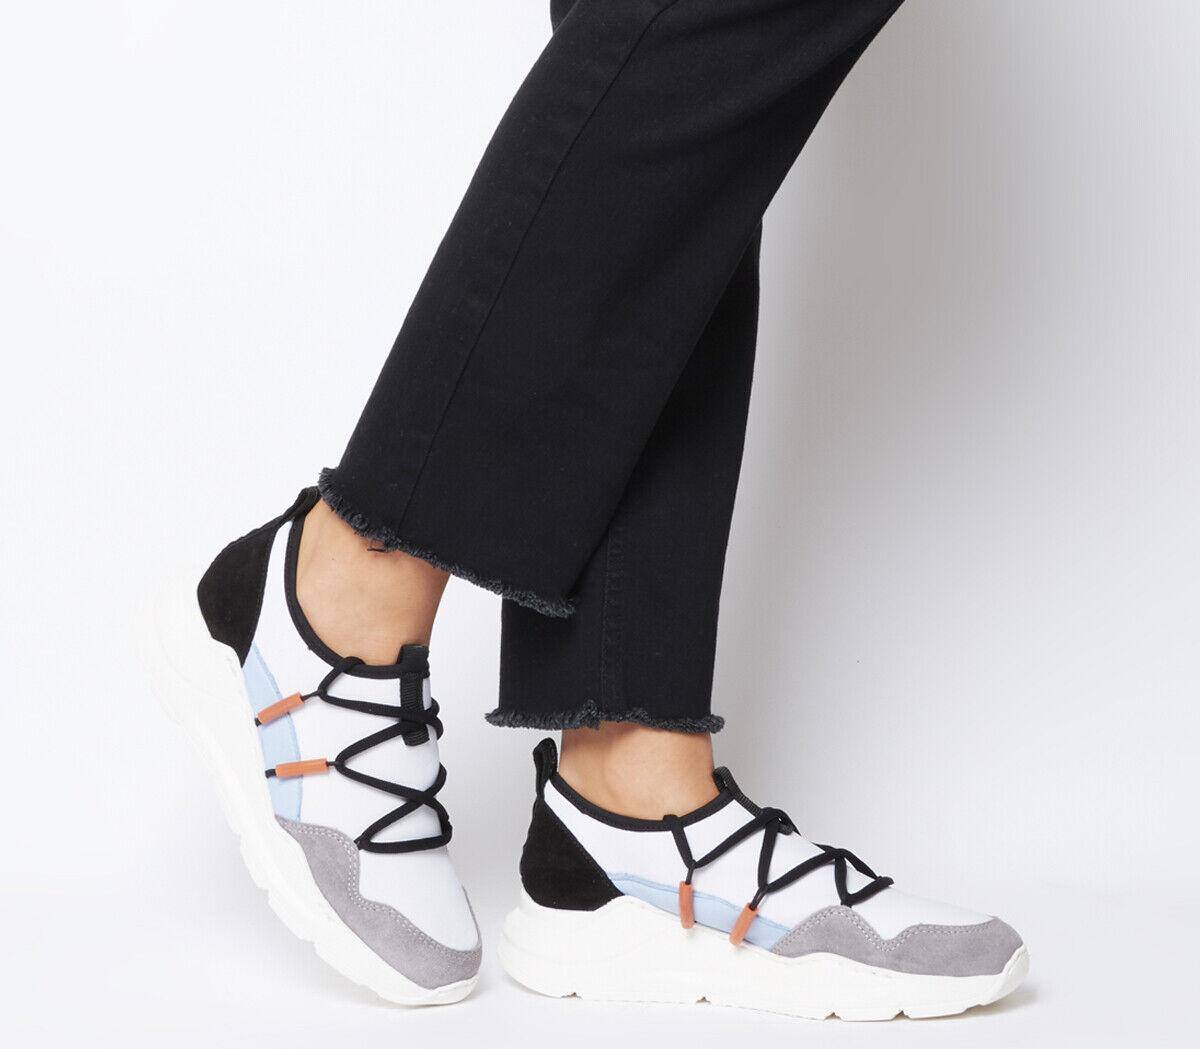 Zapatillas para mujer Oki Kutsu Heishi blancoo gris Naranja Naranja Naranja Pisos  online barato